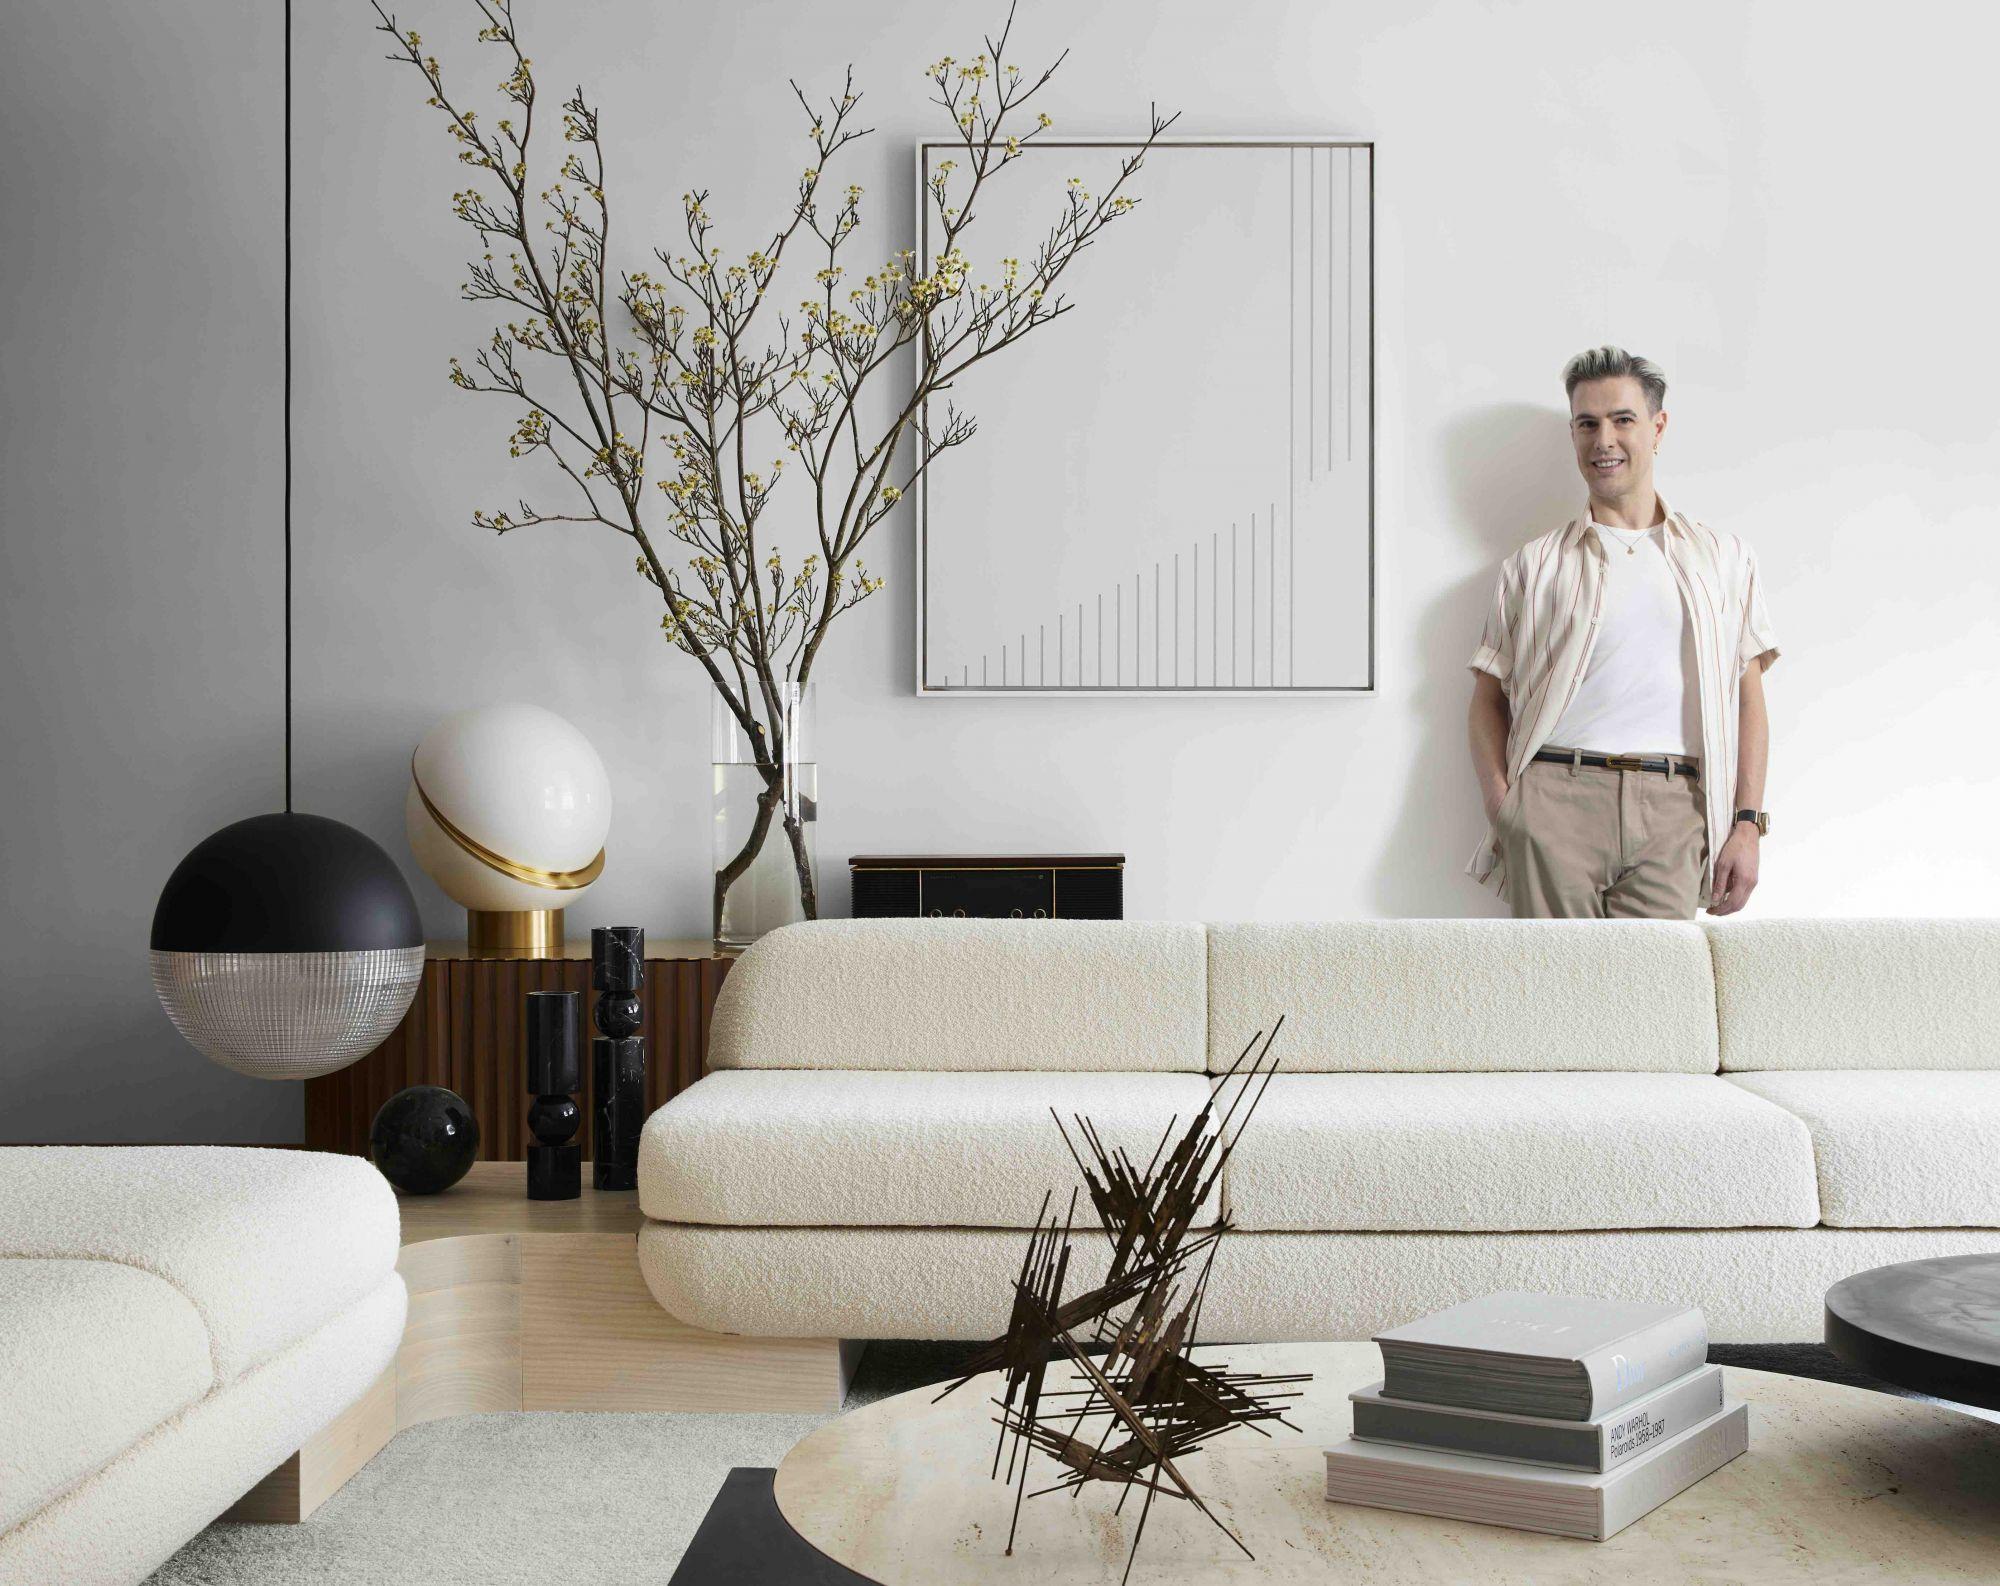 Home Tour: Inside Designer Lee Broom's Stylish, Monochromatic Penthouse in New York